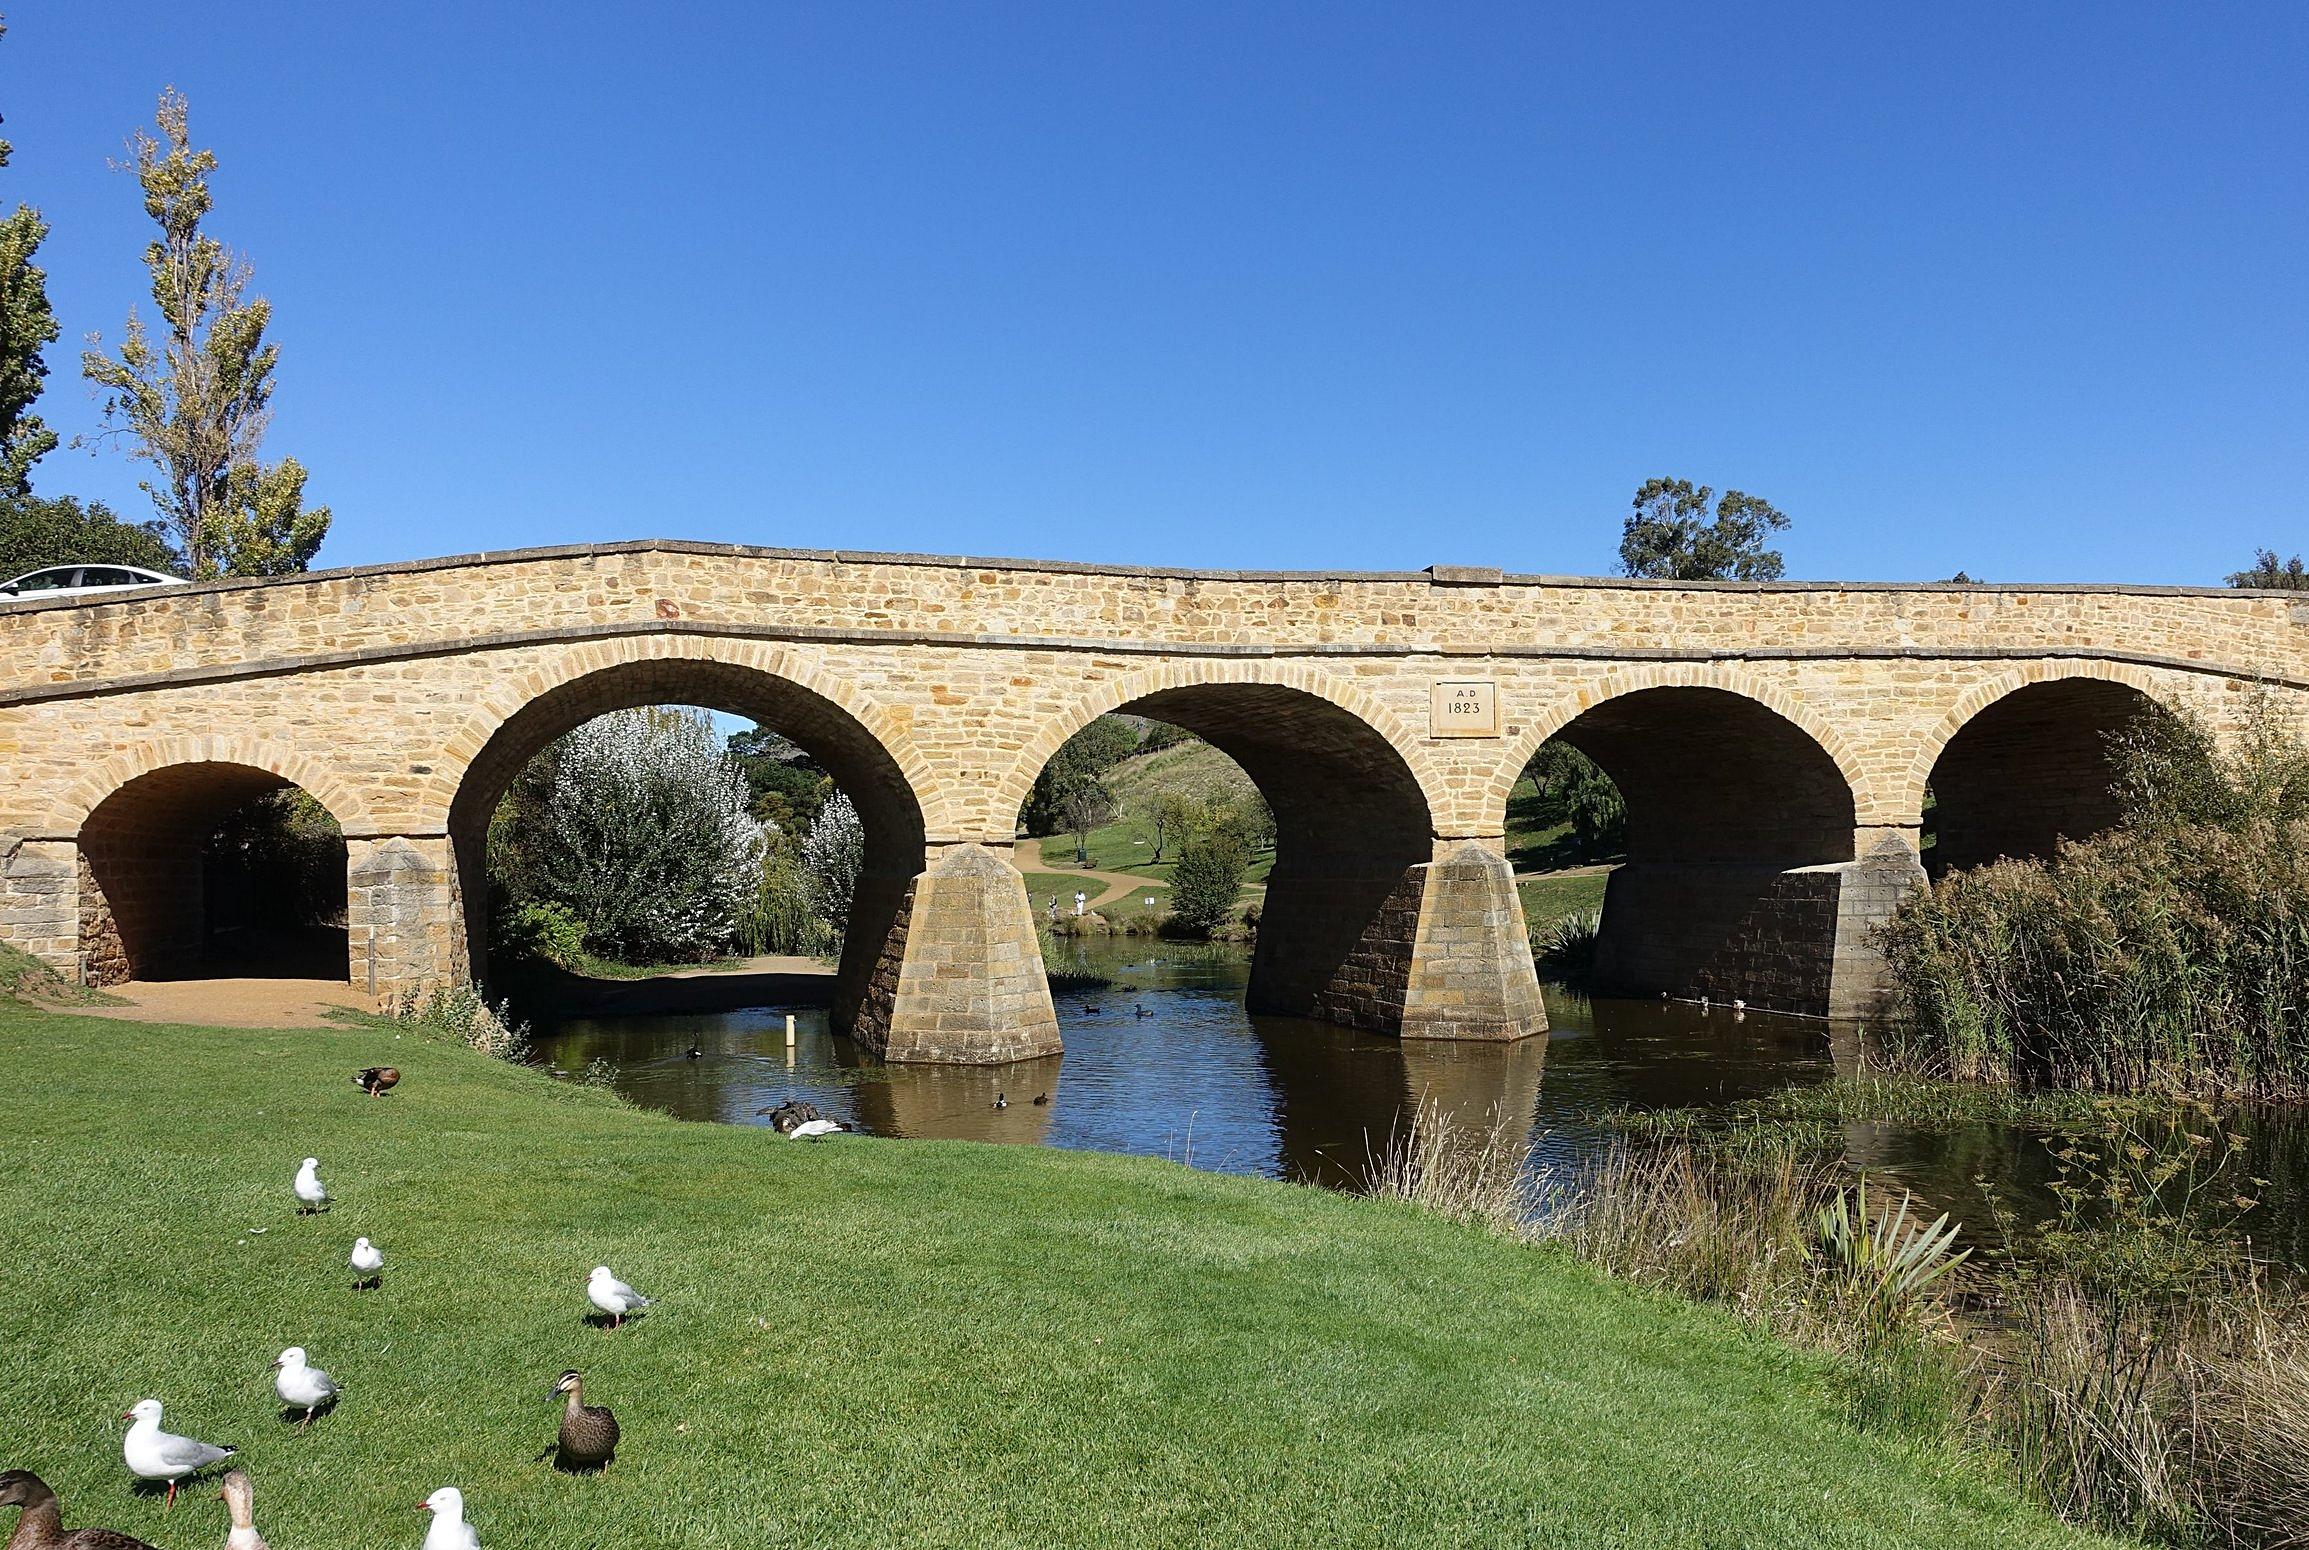 Richmond bridge - Australia's oldest